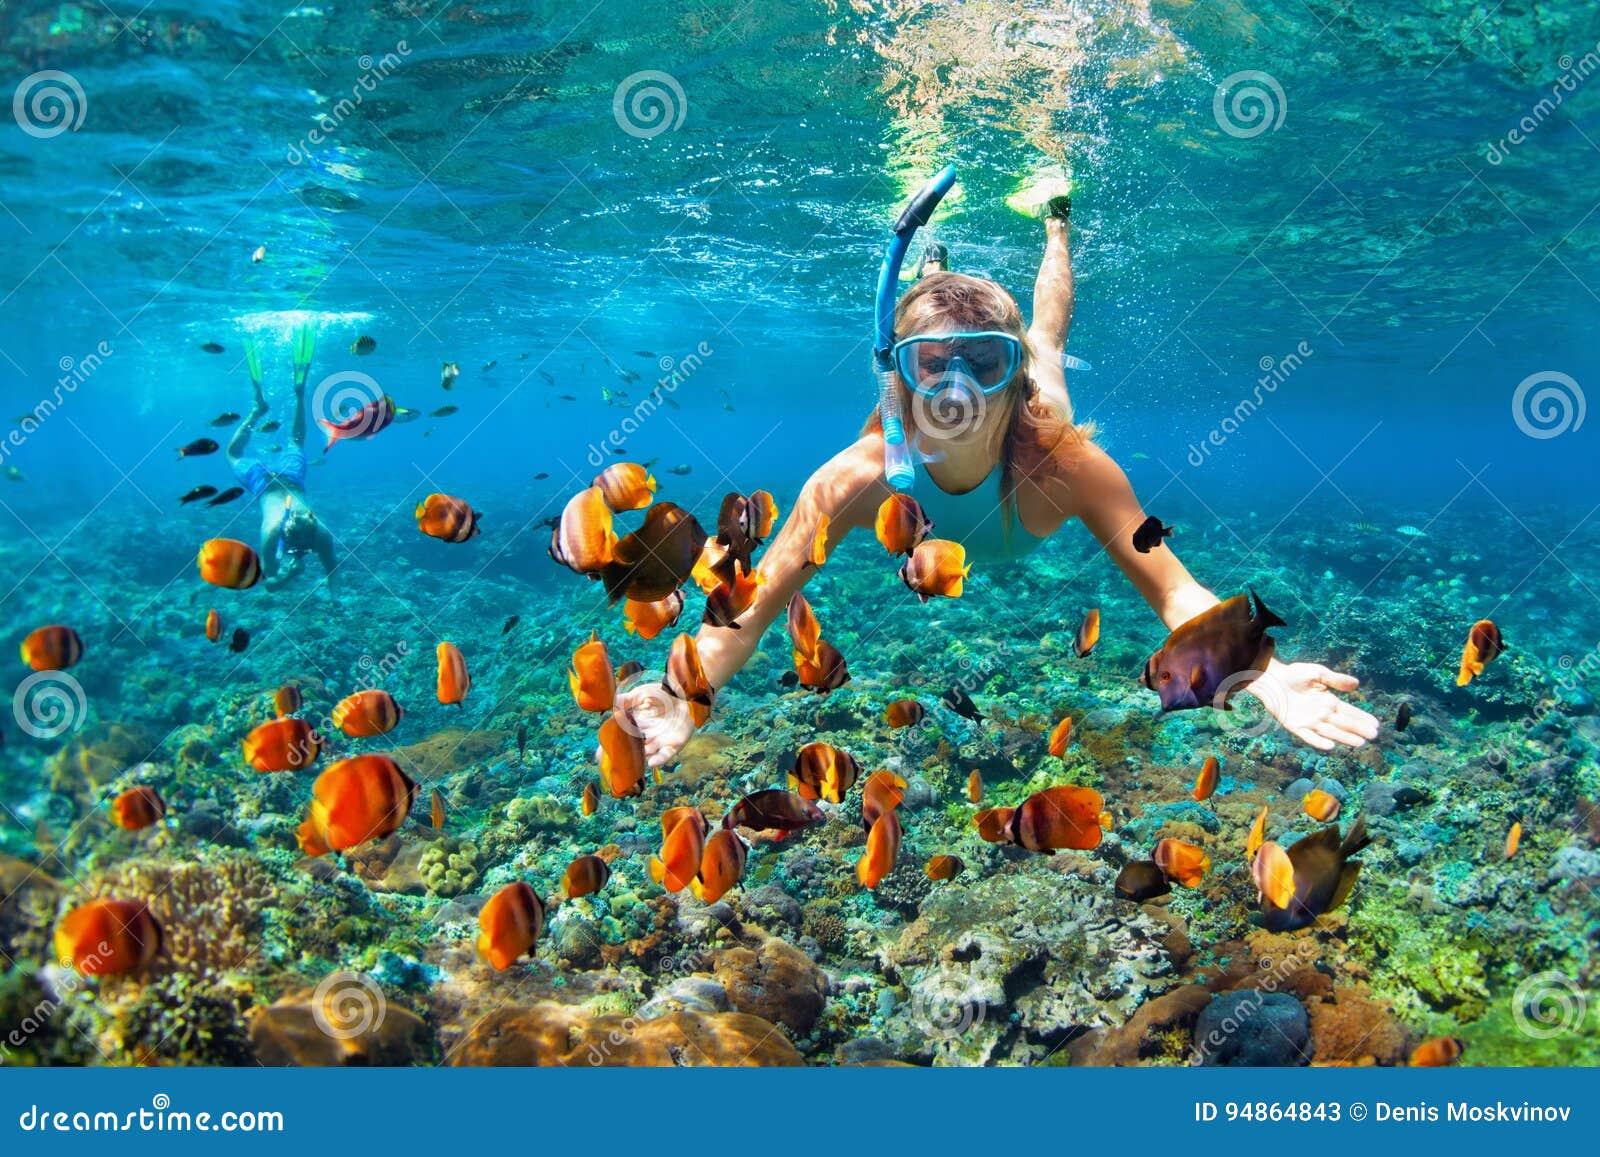 Happy couple snorkeling underwater over coral reef